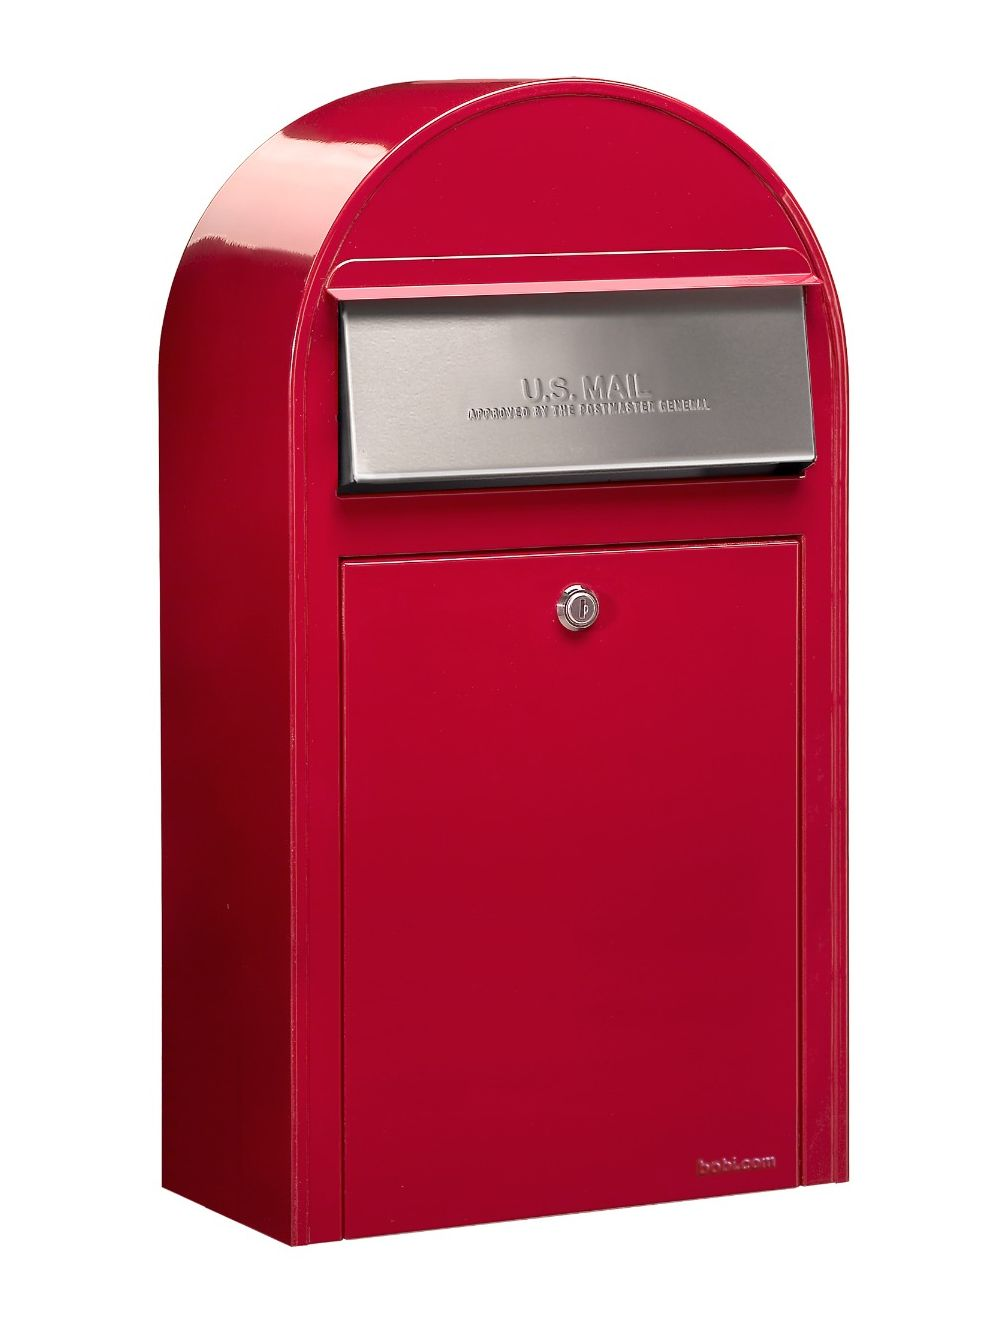 USPS Bobi Grande (S) Slim Red Mailbox